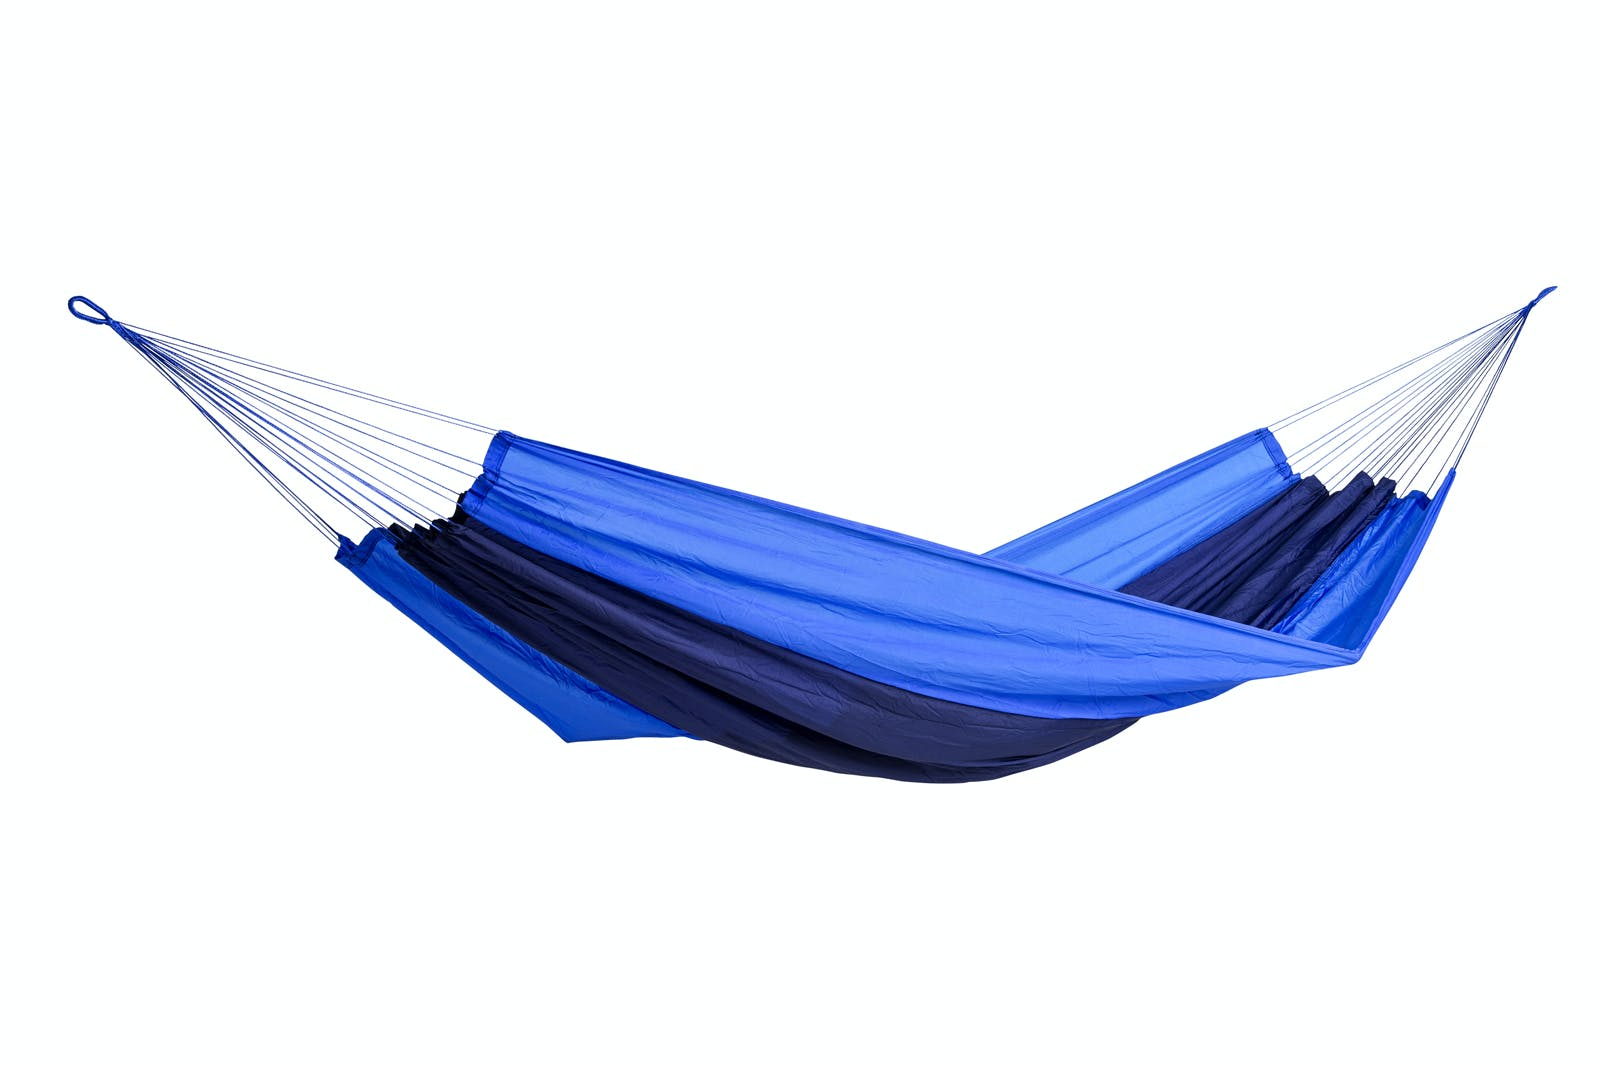 Hamac de jardin / voyage / randonnée en soie de parachute Silk Traveller Ocean Blue XL AMAZONAS